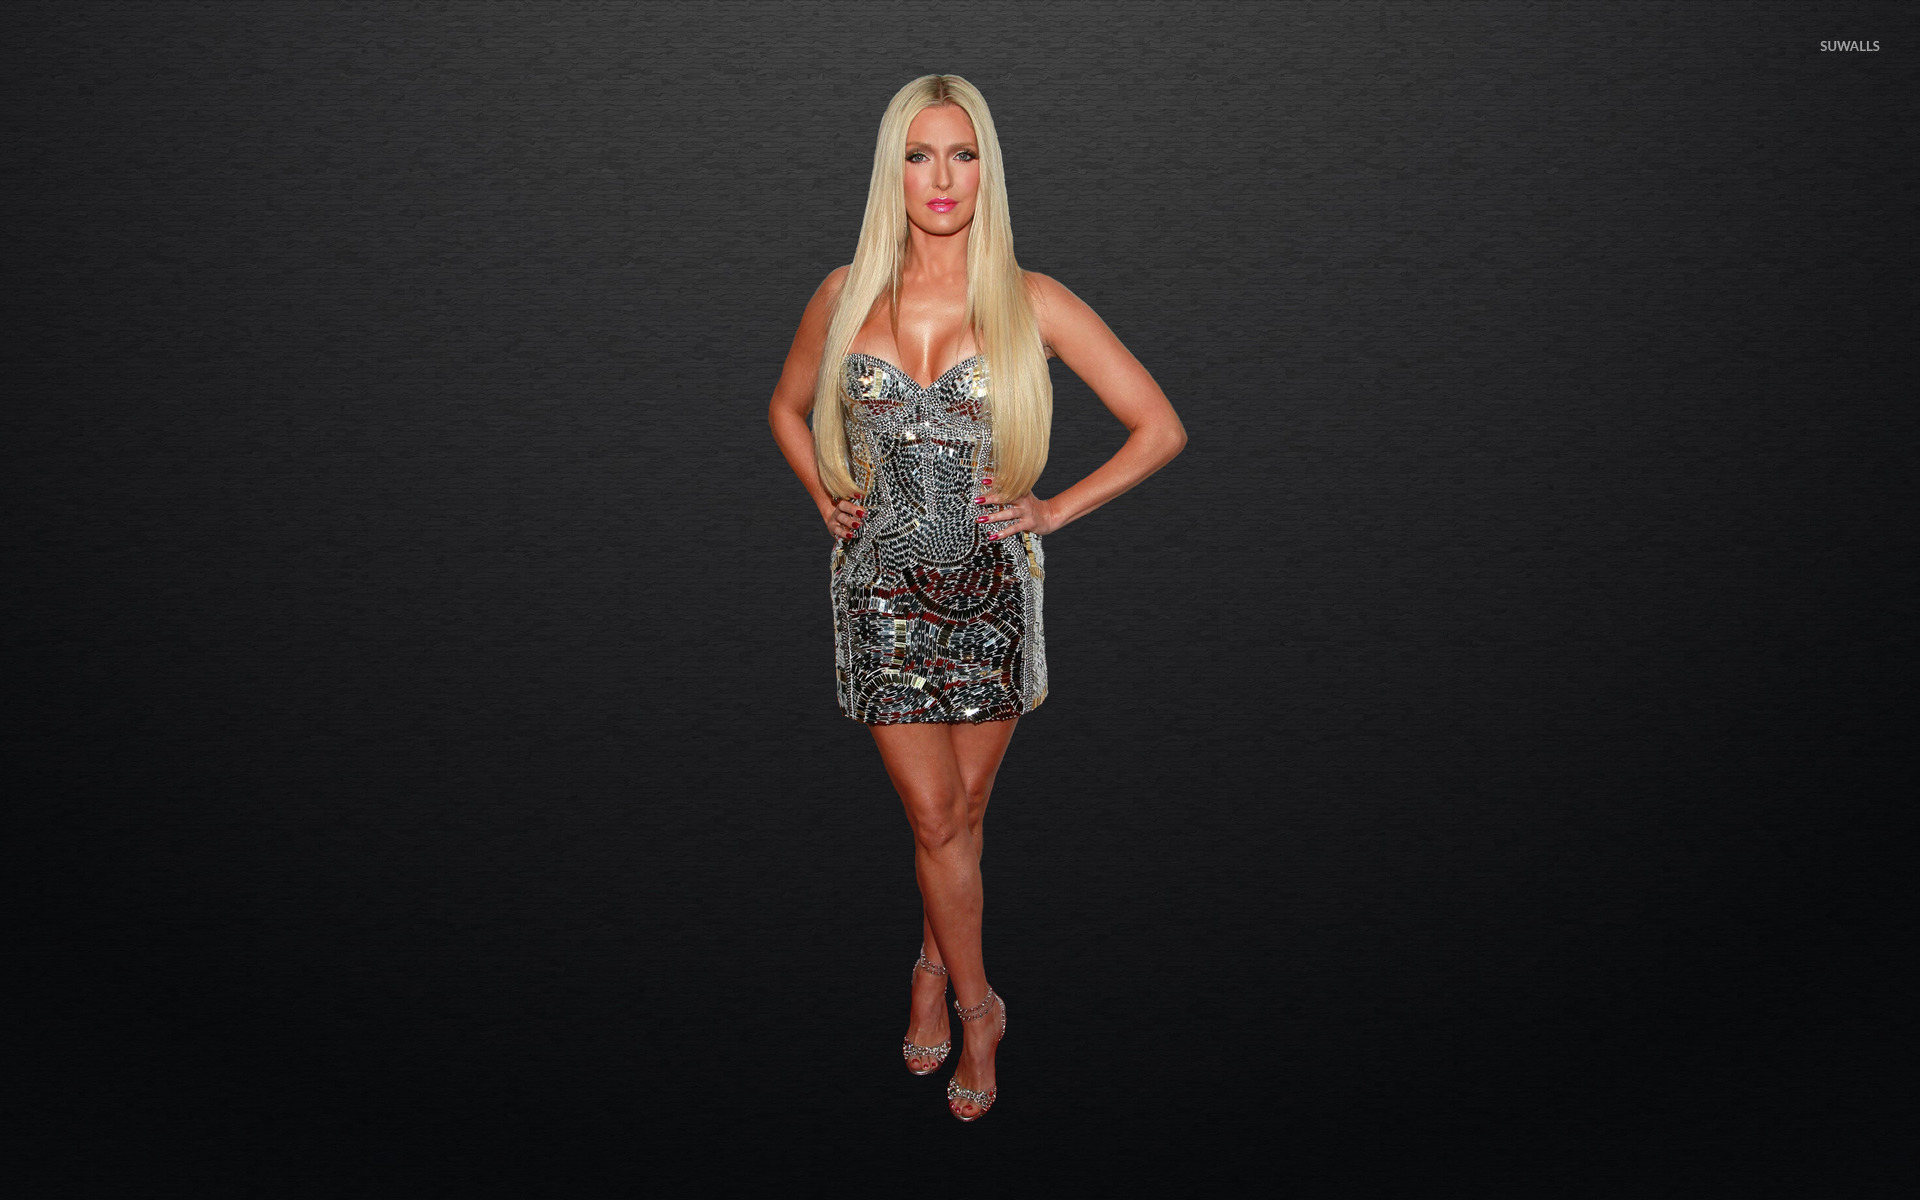 Erika Jayne wallpaper - Celebrity wallpapers - #11677